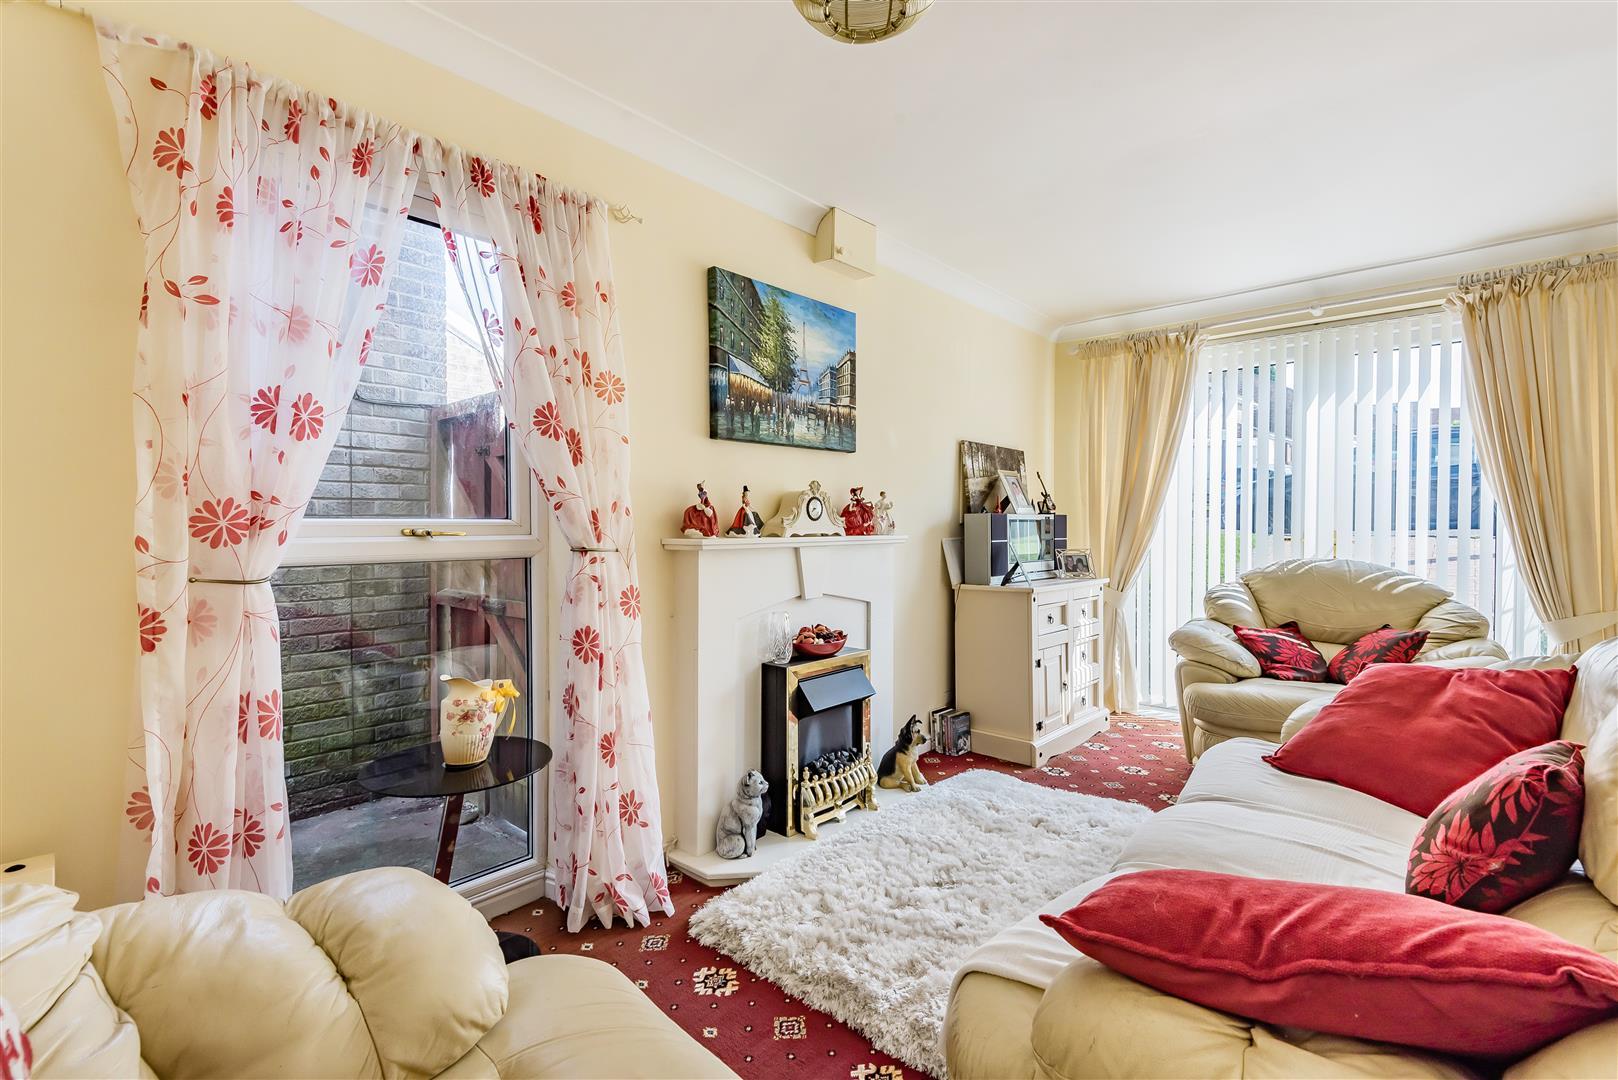 Glanymor Park Drive, Loughor, Swansea, SA4 6UQ